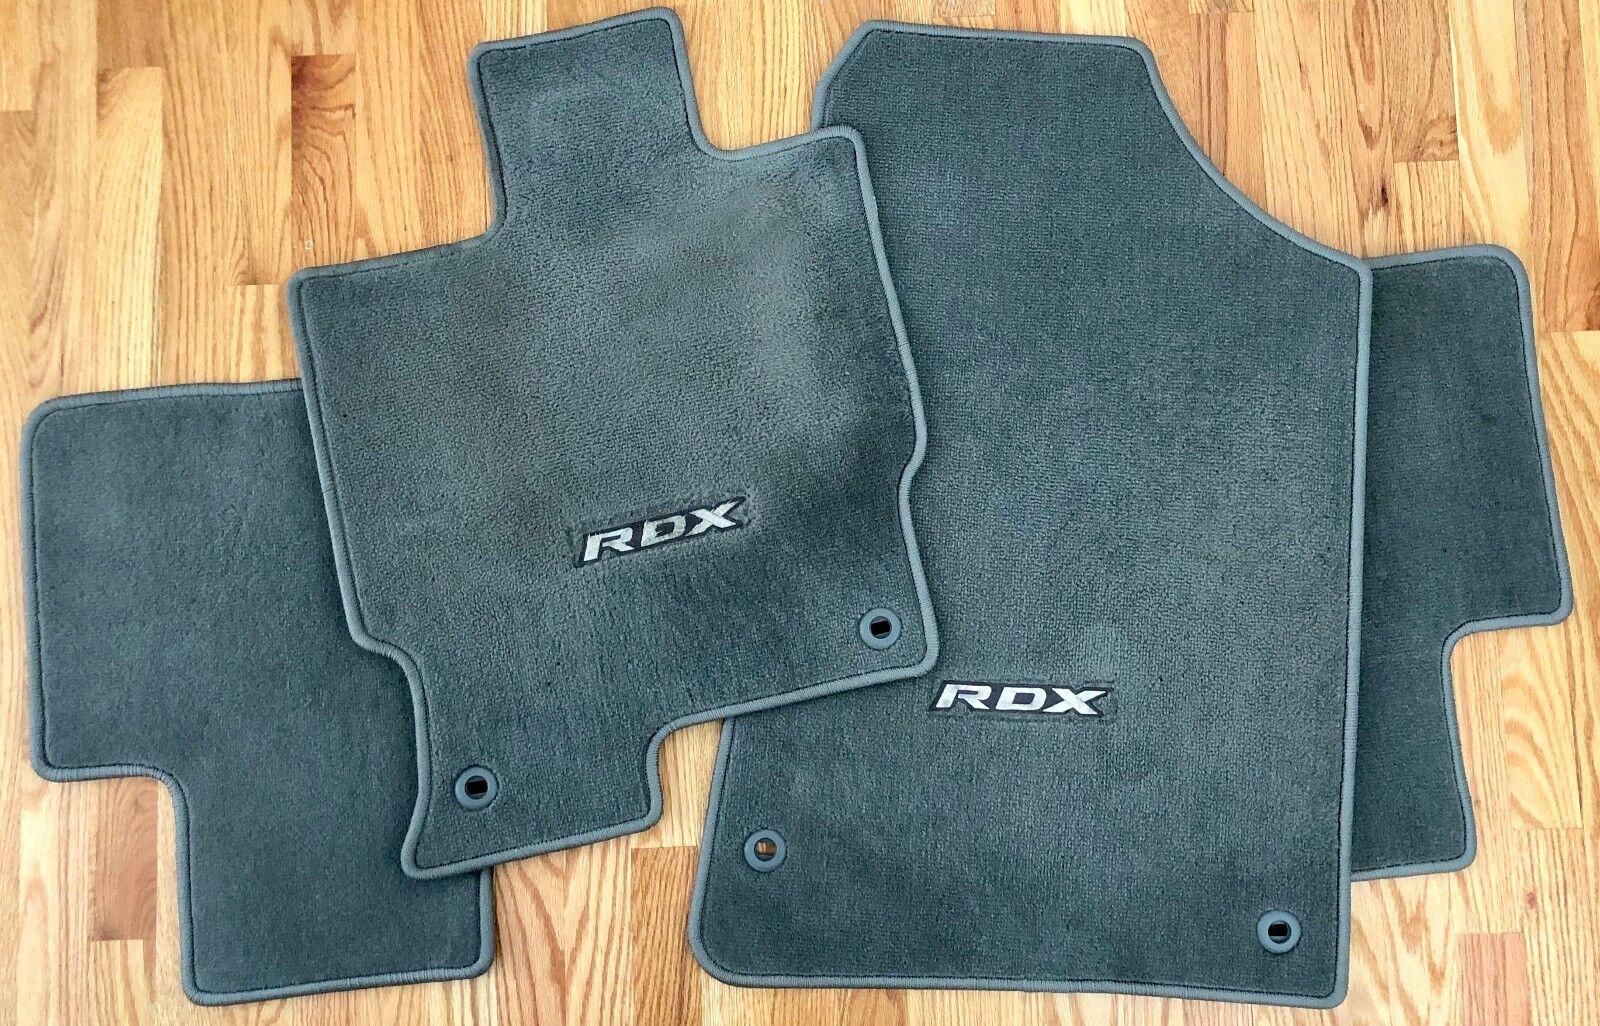 ACURA OEM ORIGINAL RDX 2009-2012 GRAY CARPET x3 FACTORY FLOOR MAT SET!